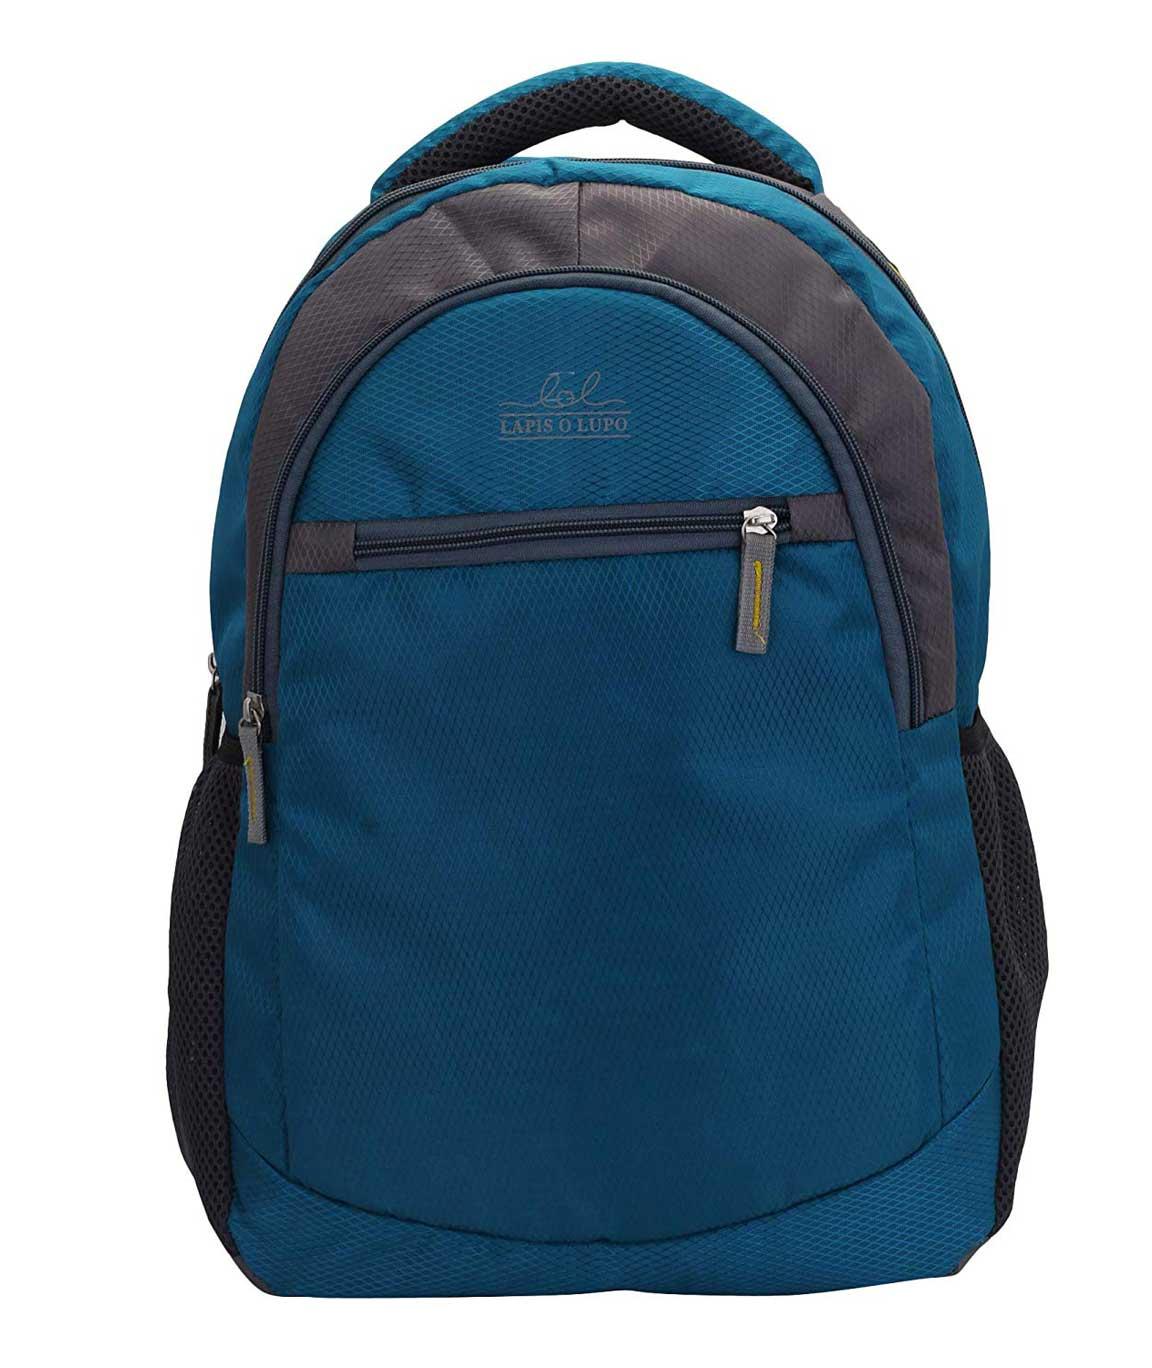 Lapis O Lupo Neutral Luminary Laptop Backpack (Blue)